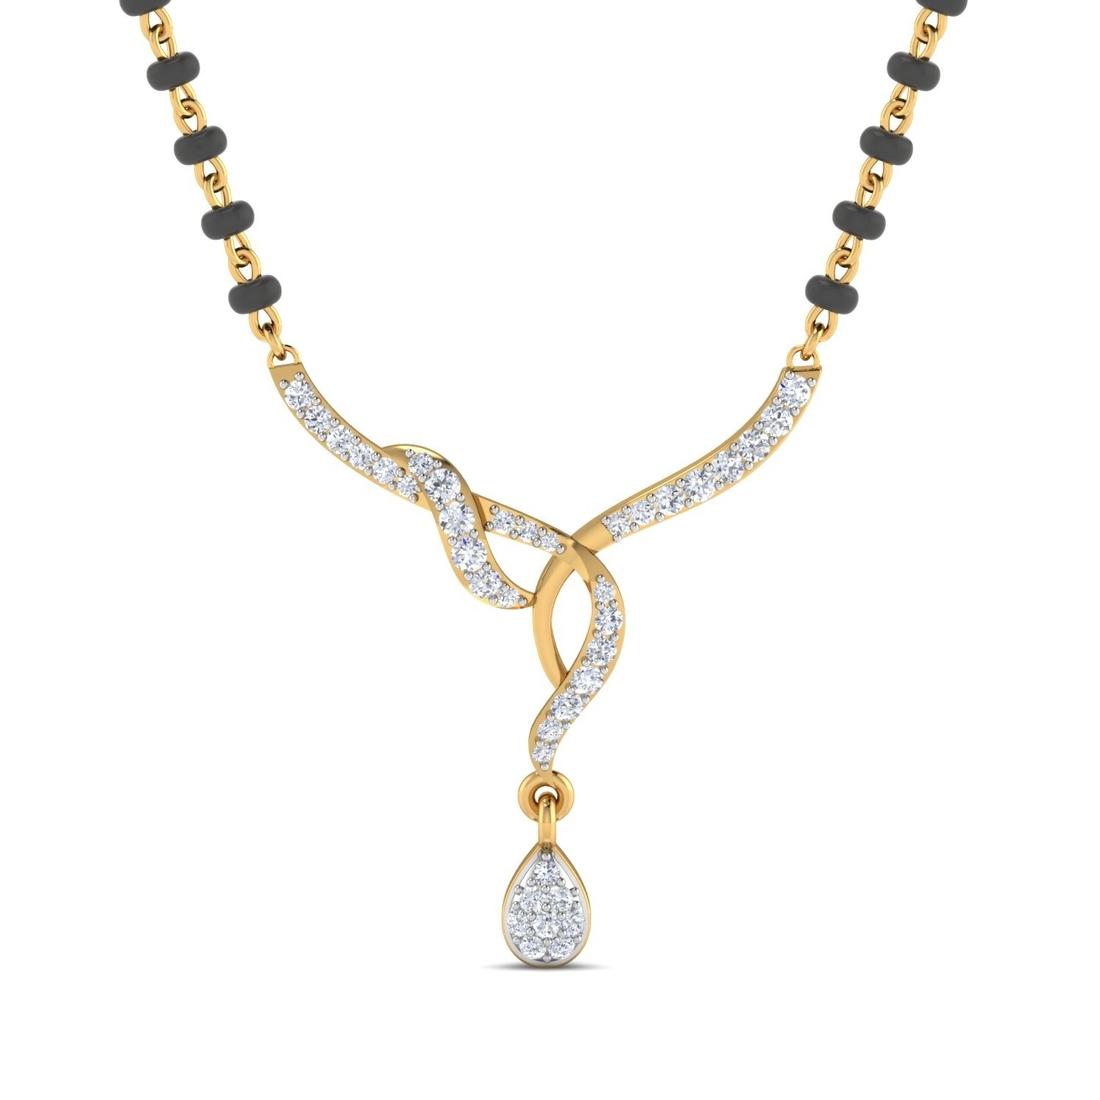 Sarvada Jewels' The Megha Mangalsutra